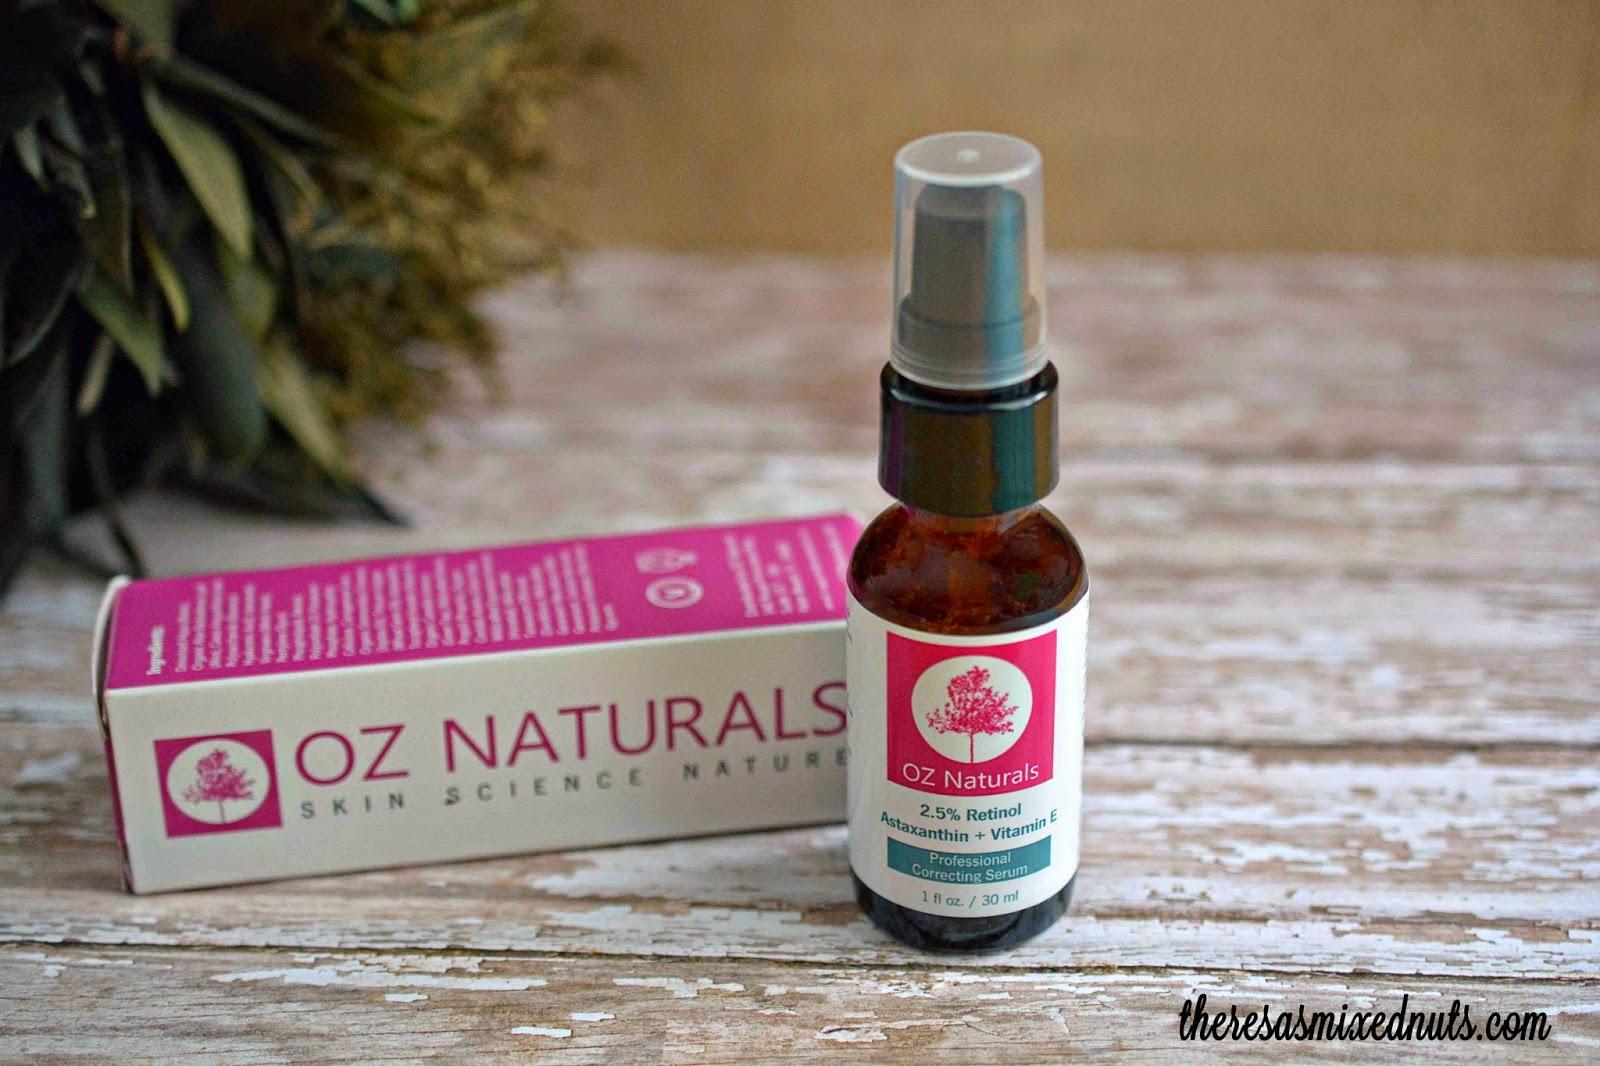 oz naturals retinol